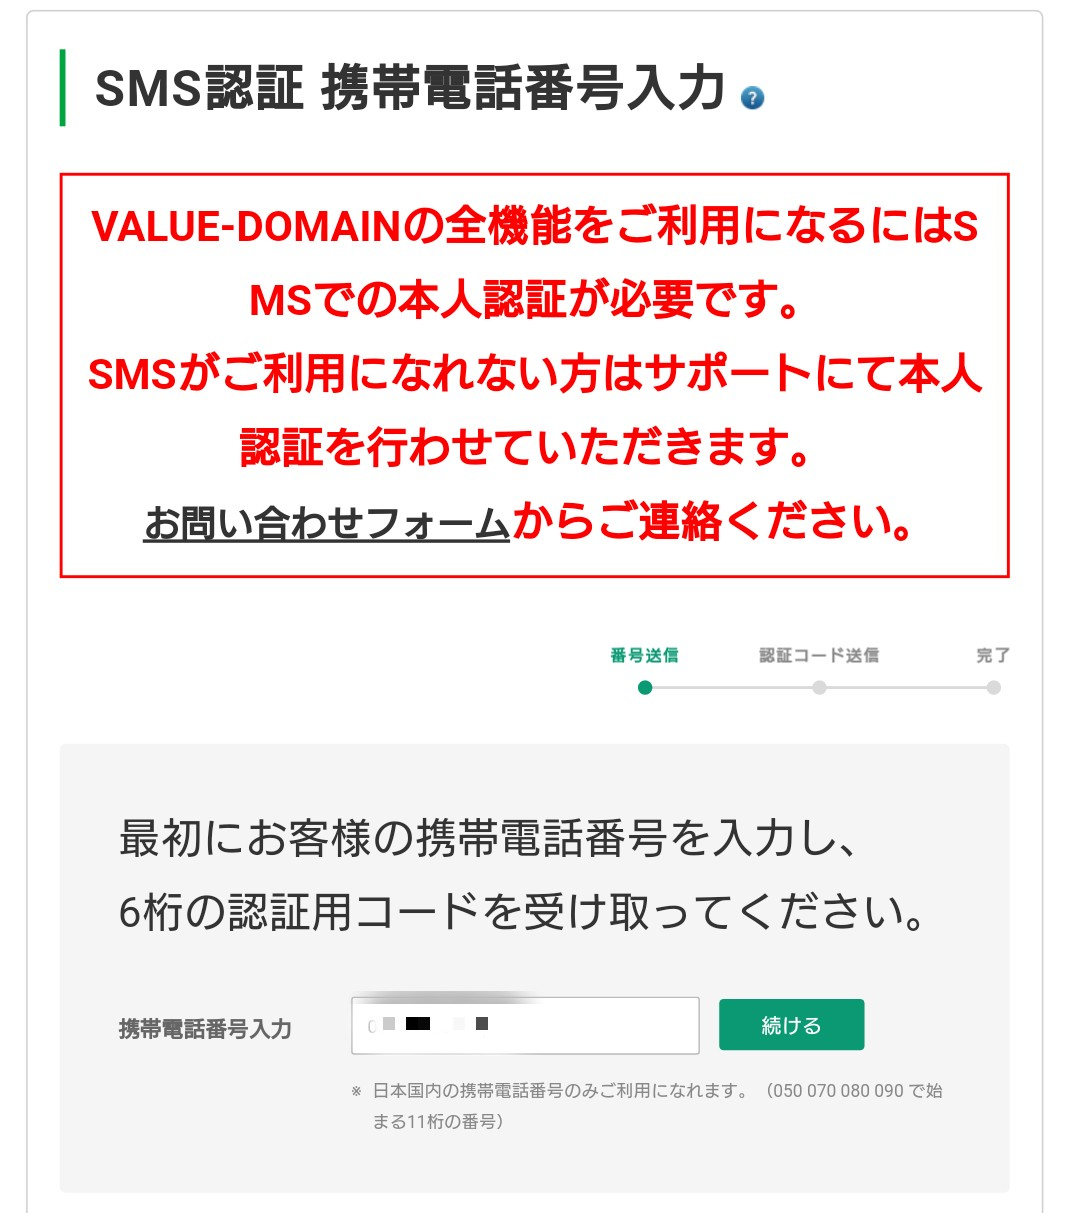 SMS認証画面(バリュードメイン)